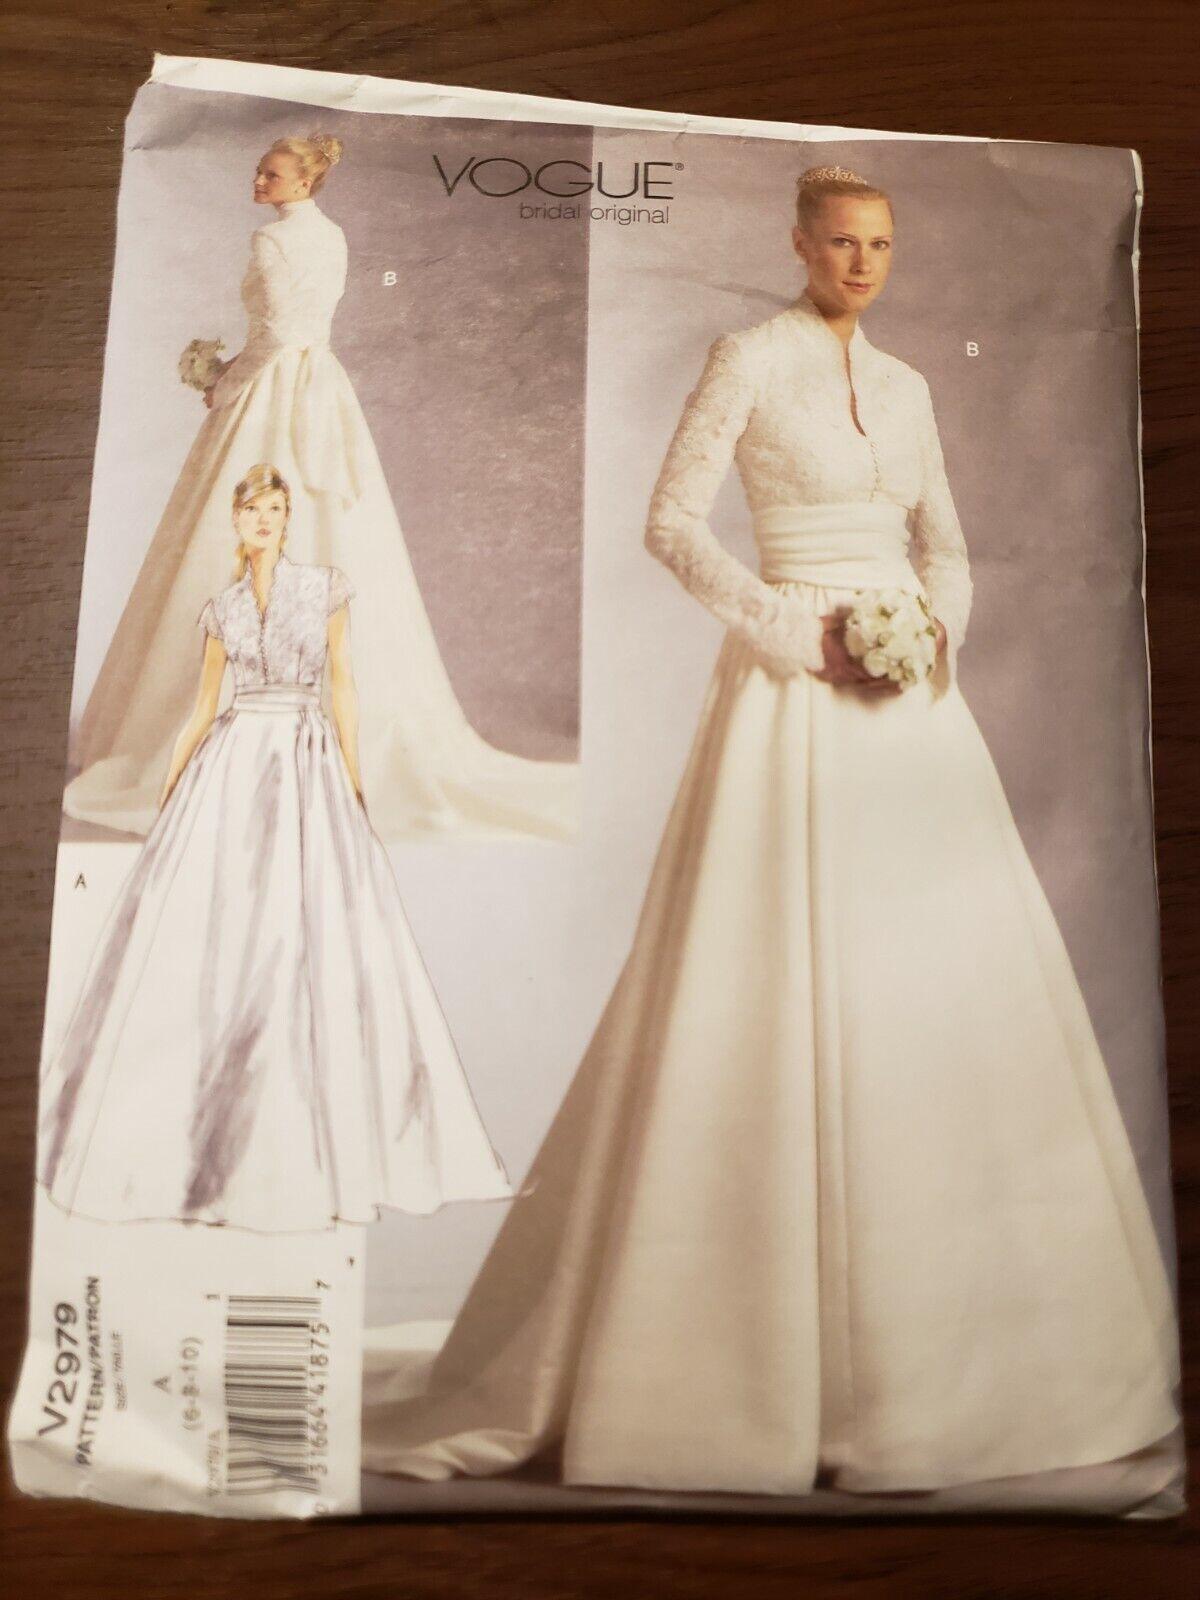 Vogue Bridal Original Pattern 2775 Wedding Gown Dress Uncut Sz 6 8 10 Bride For Sale Online Ebay